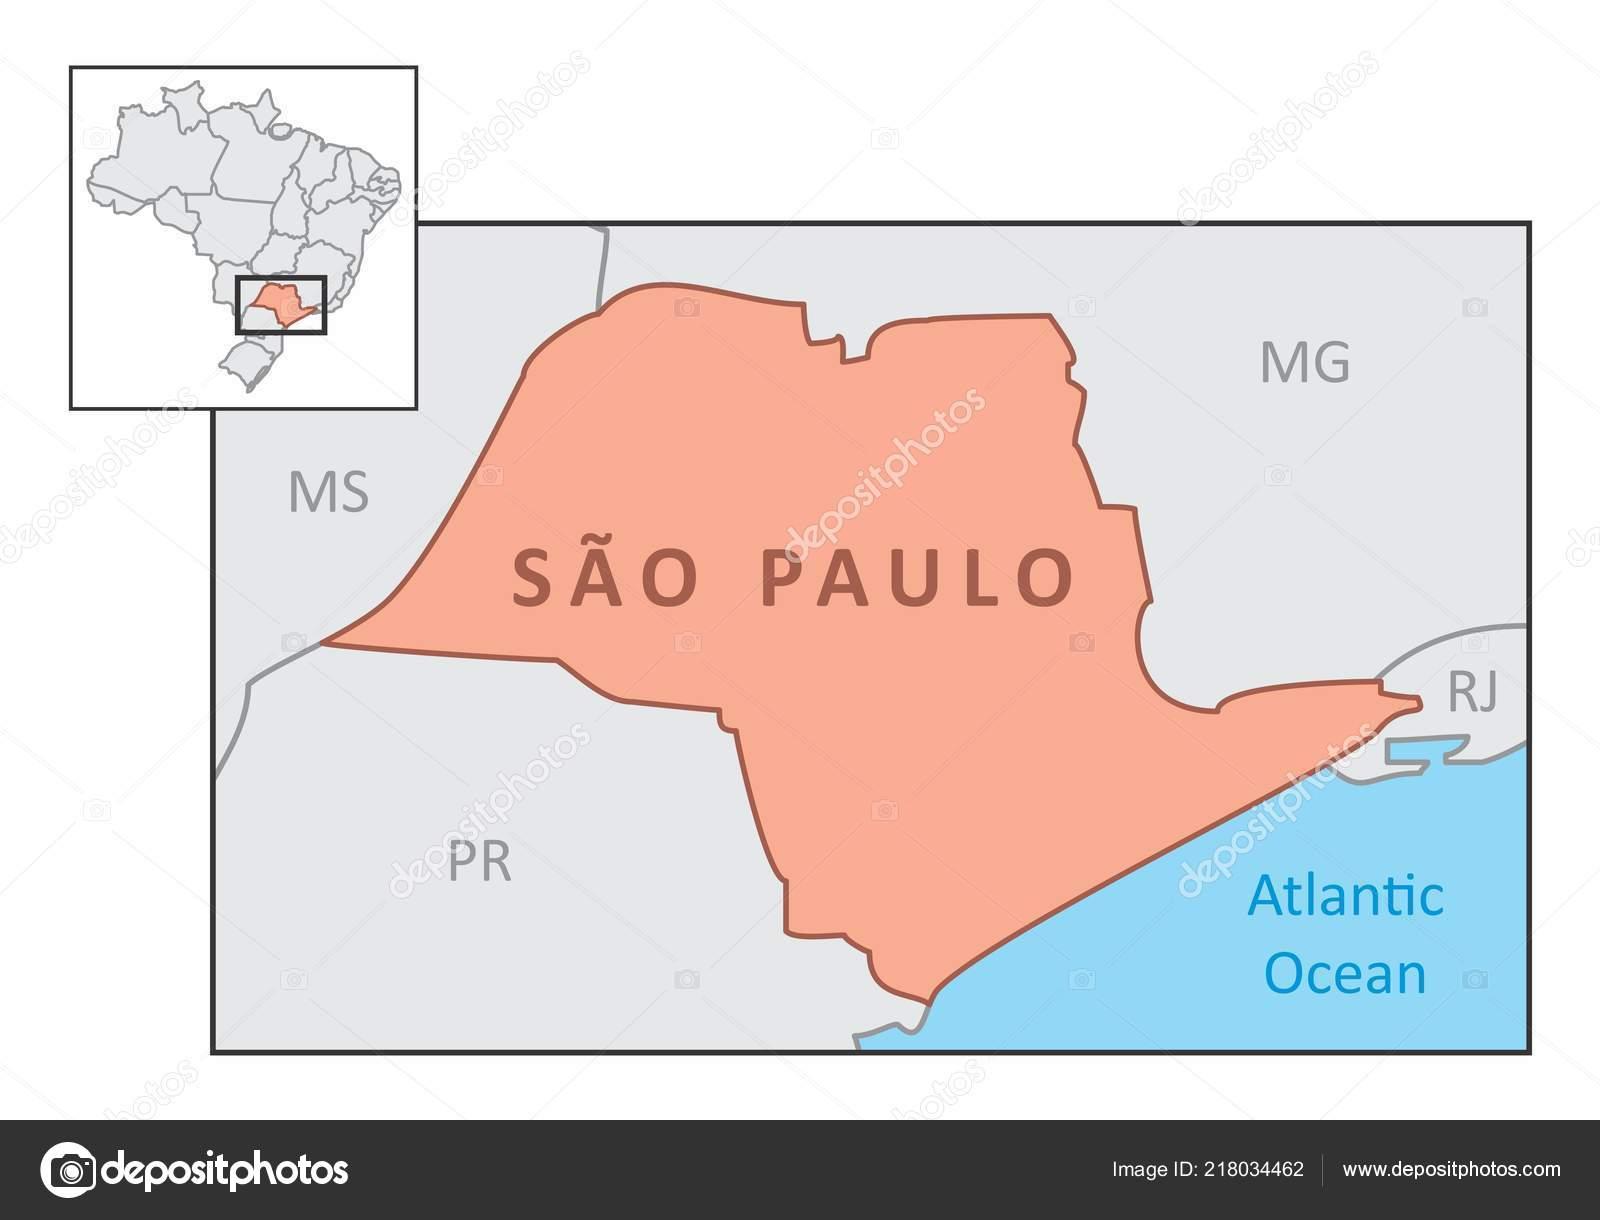 Sao Paulo State Map.Map State Sao Paulo Its Location Brazilian Territory Stock Vector